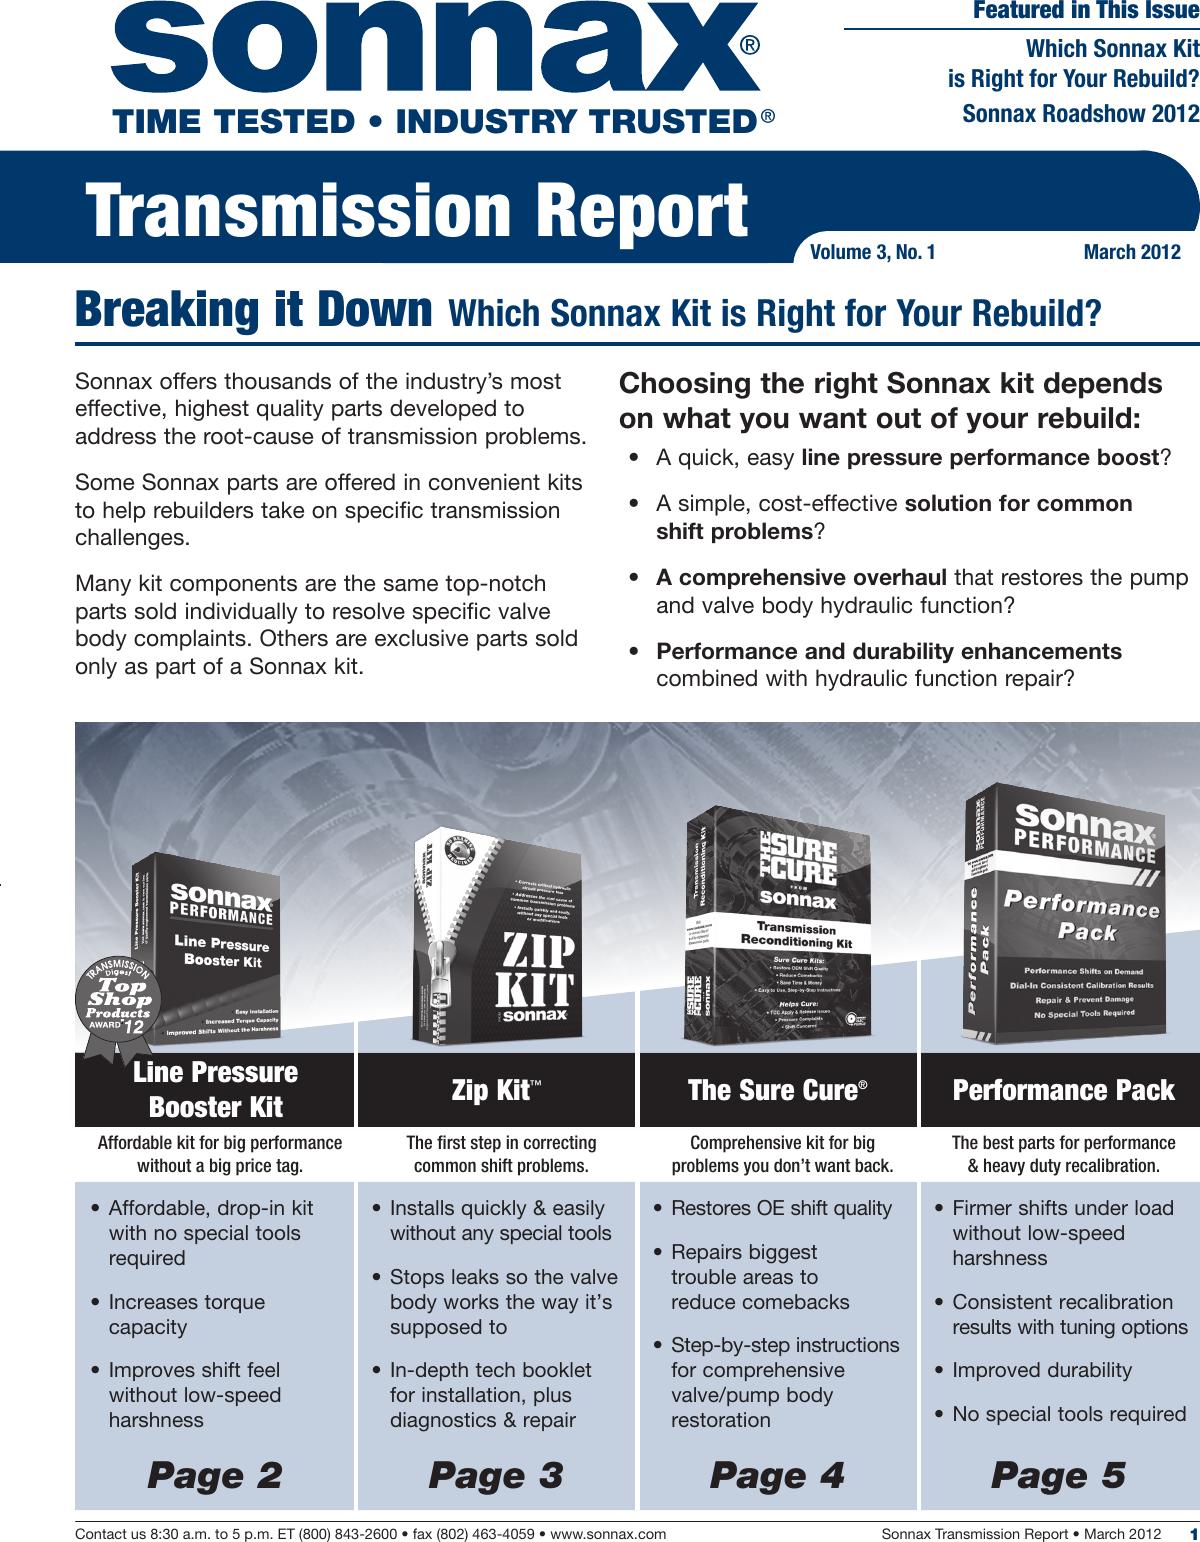 Sonnax Trans Report V3n1